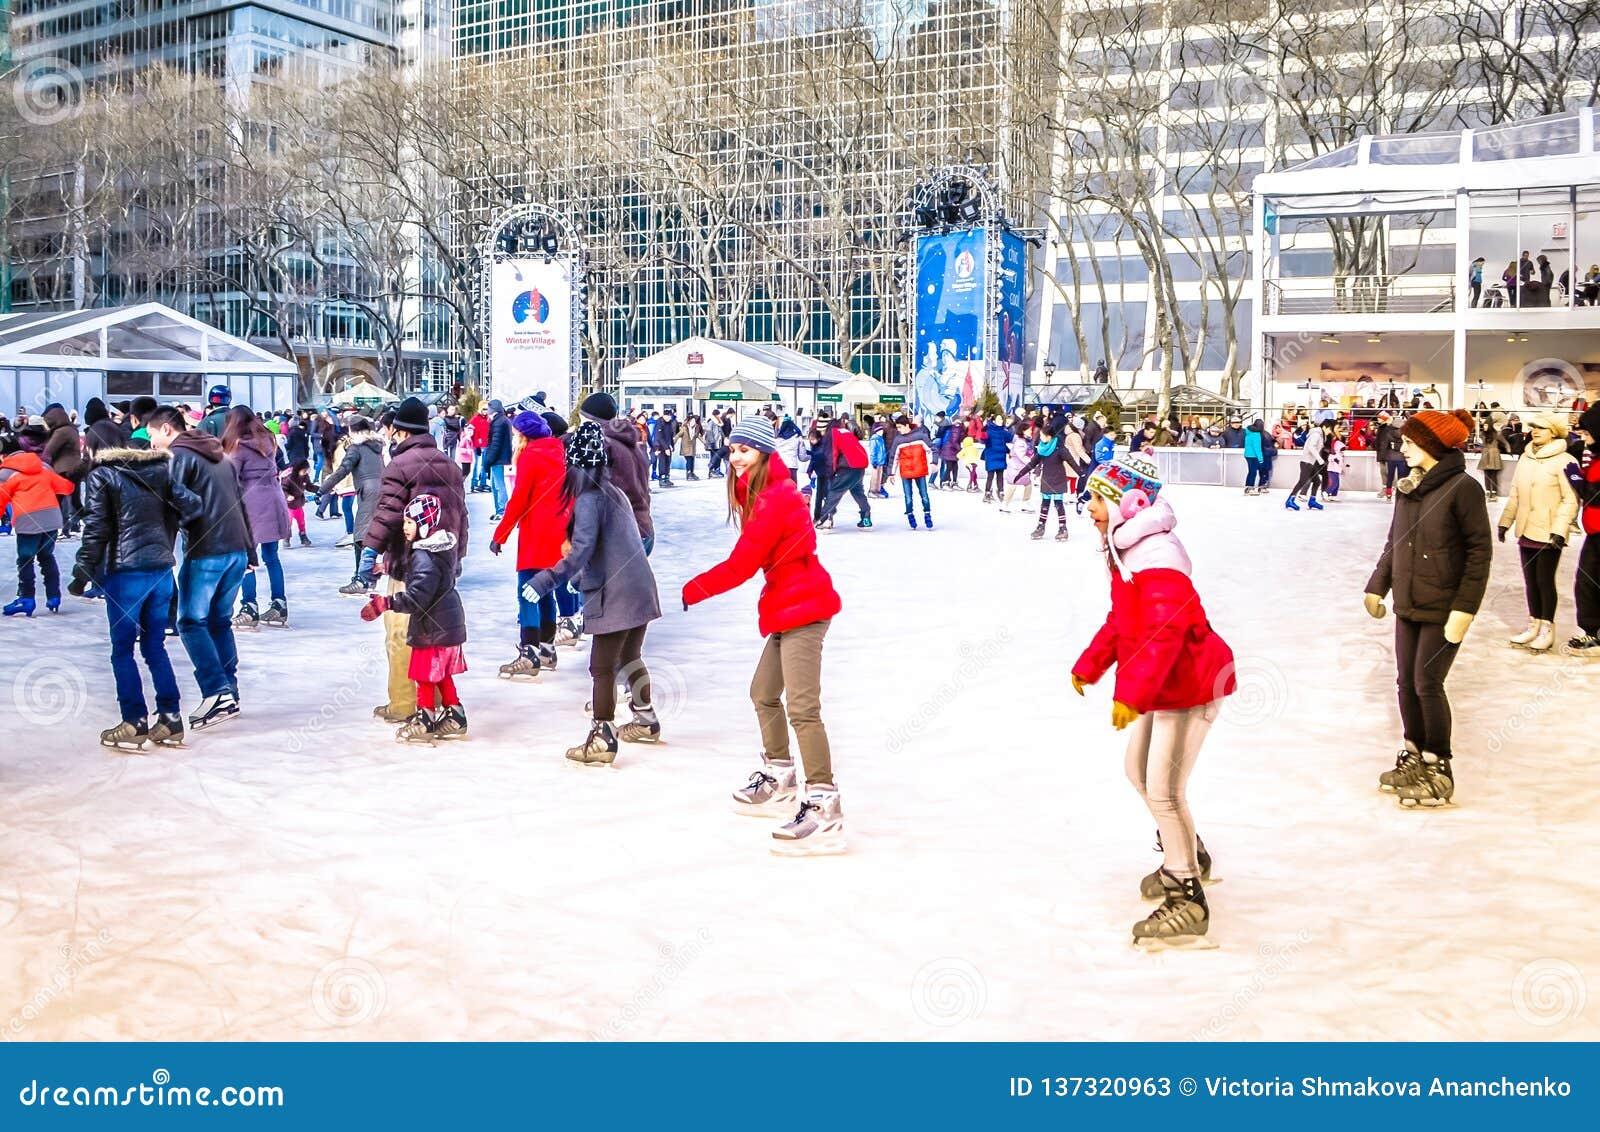 Christmas Village Ice Skating Rink.People At Skating Rink At Bryant Park On Christmas Downtown